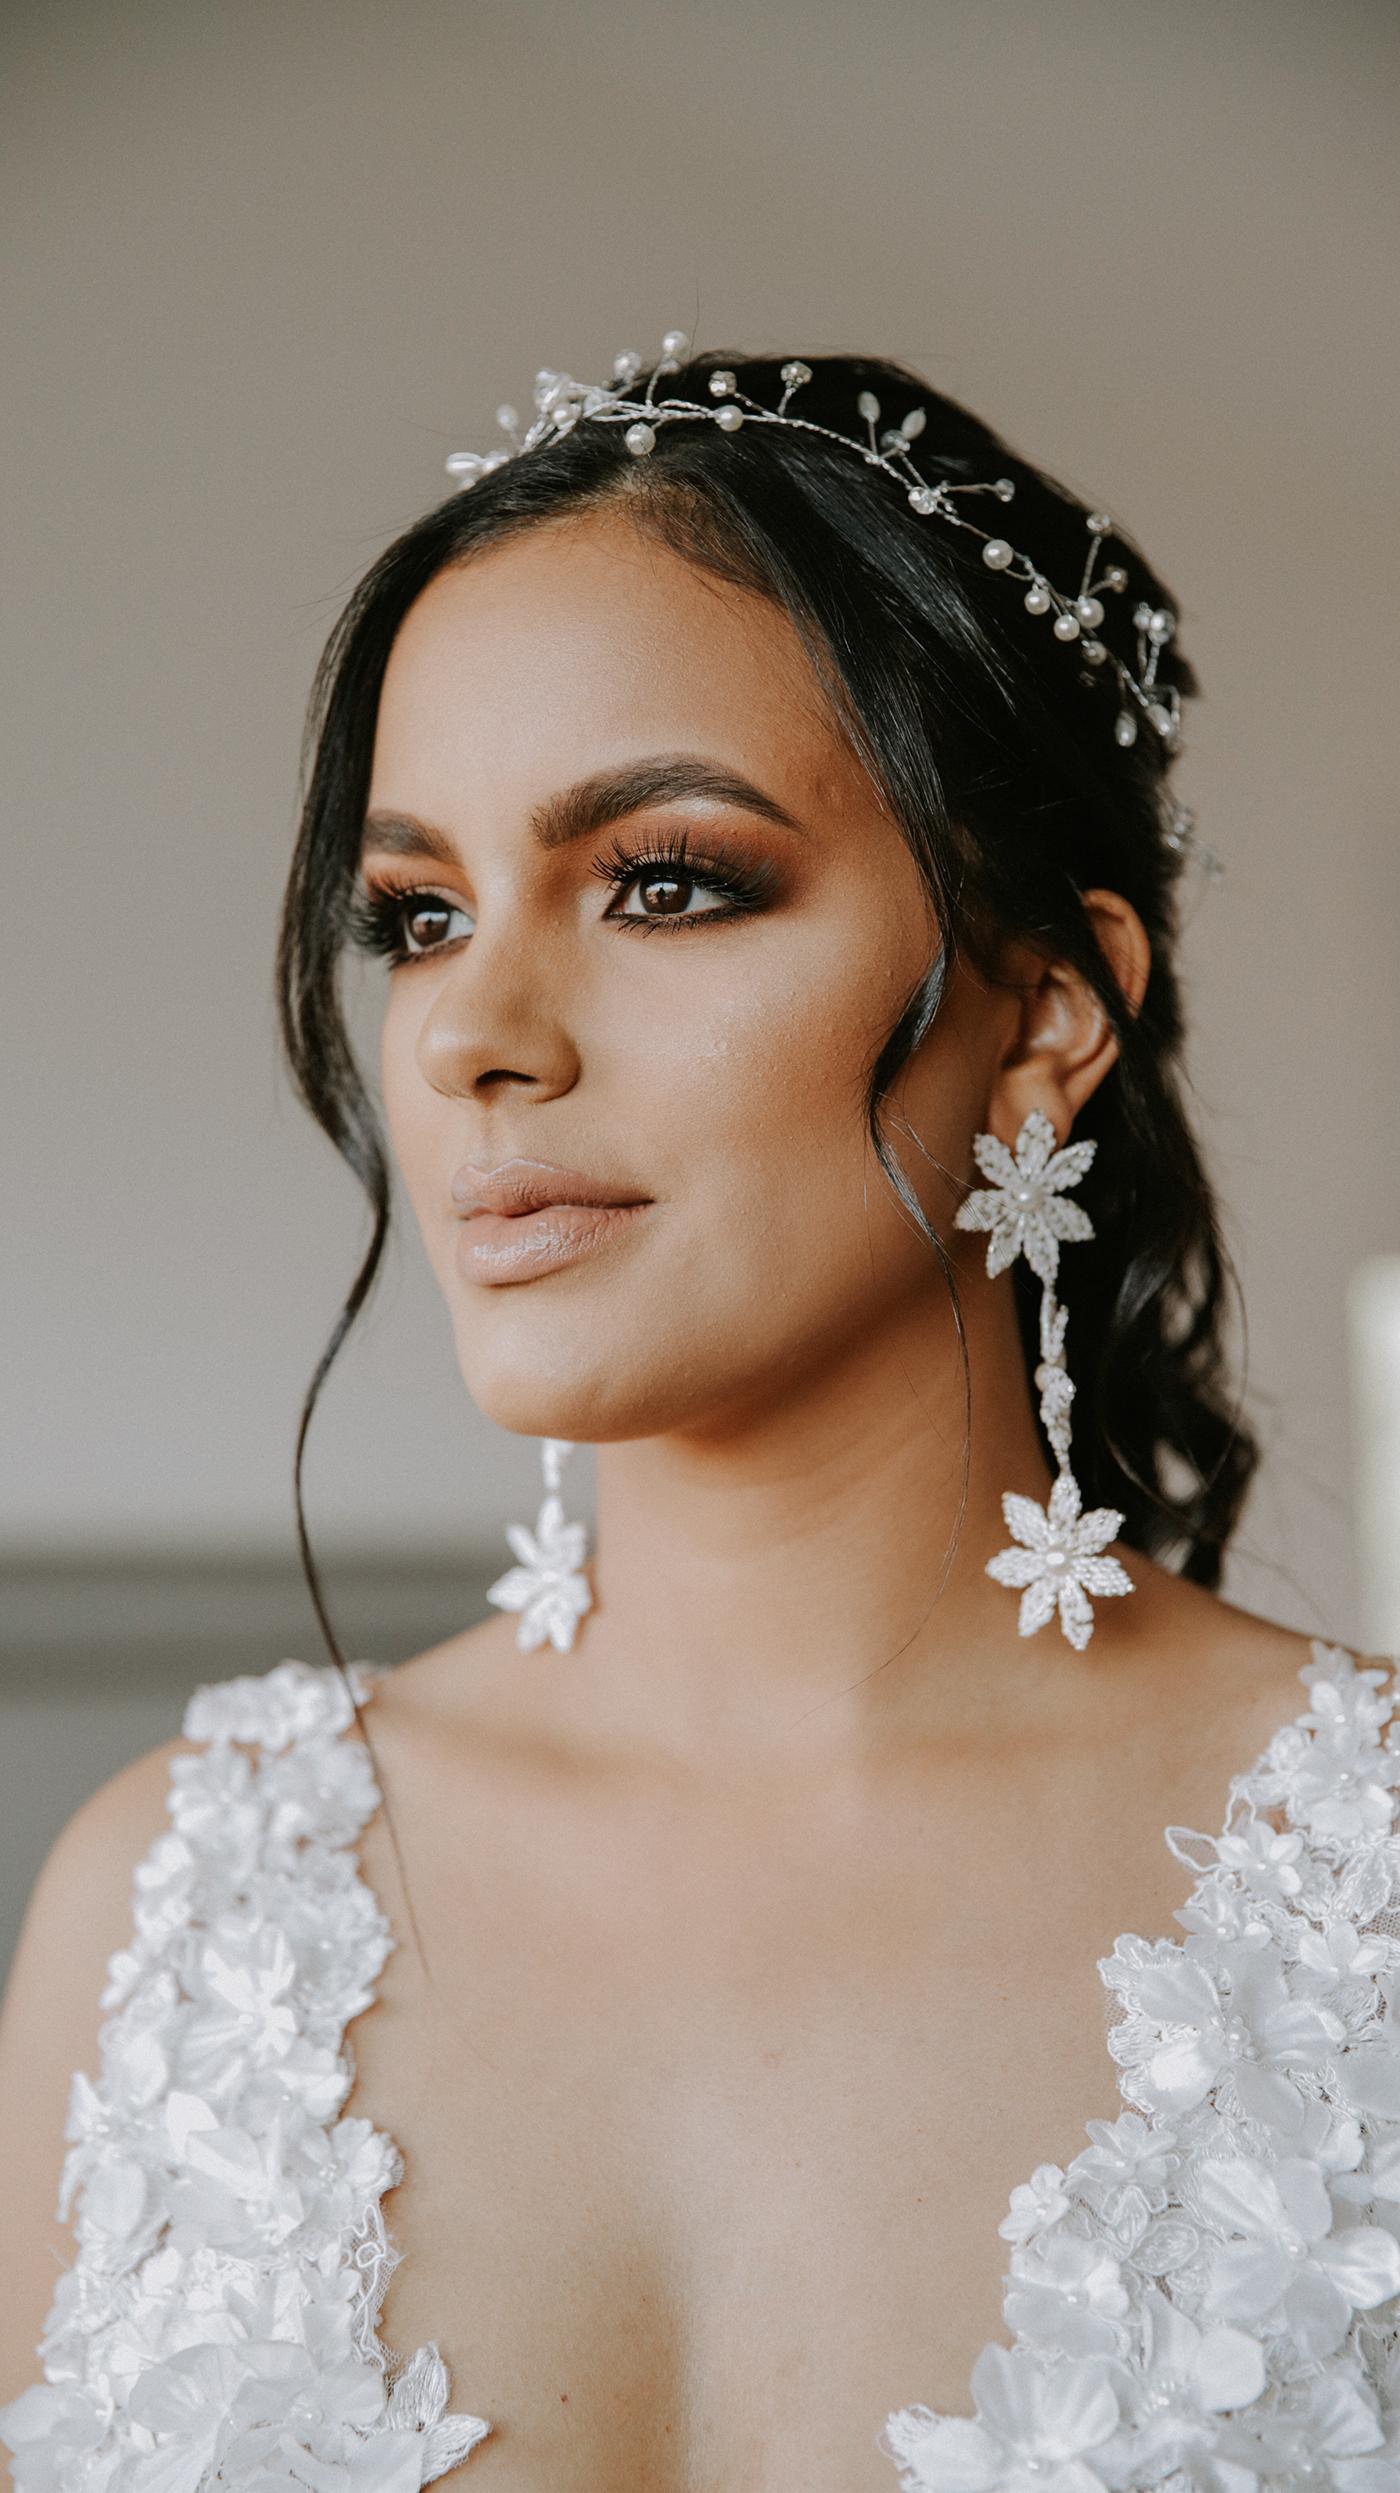 Image may contain: person, fashion accessory and bride